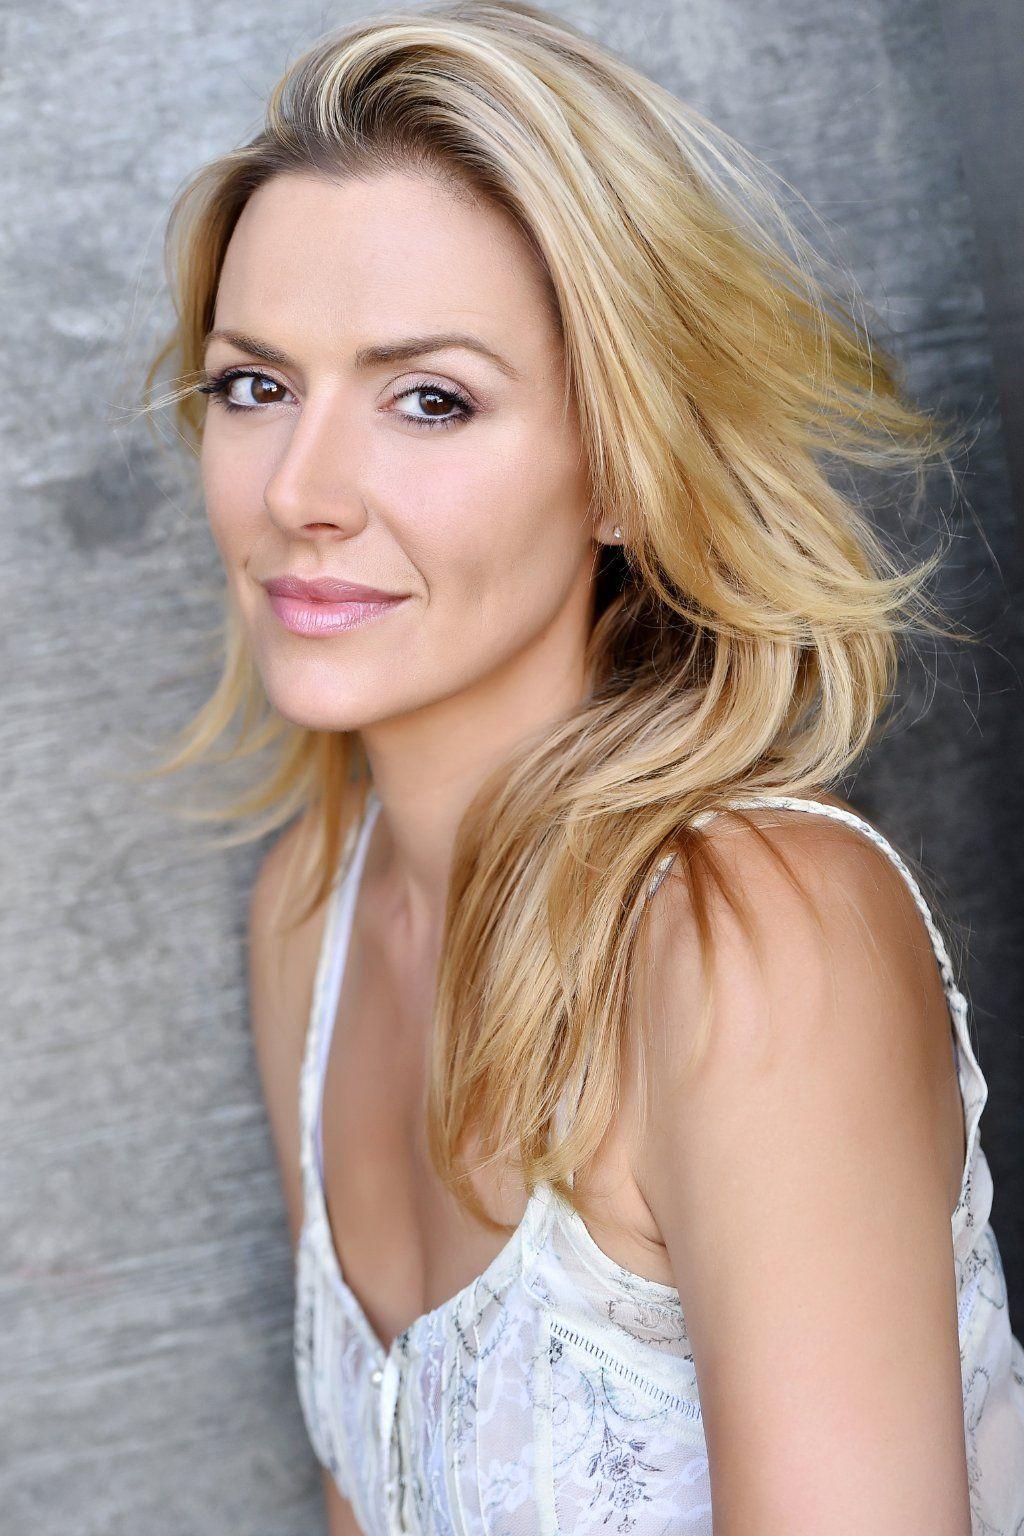 Allison Mcatee Nude allison mcatee beautiful women beautiful woman blonde why am